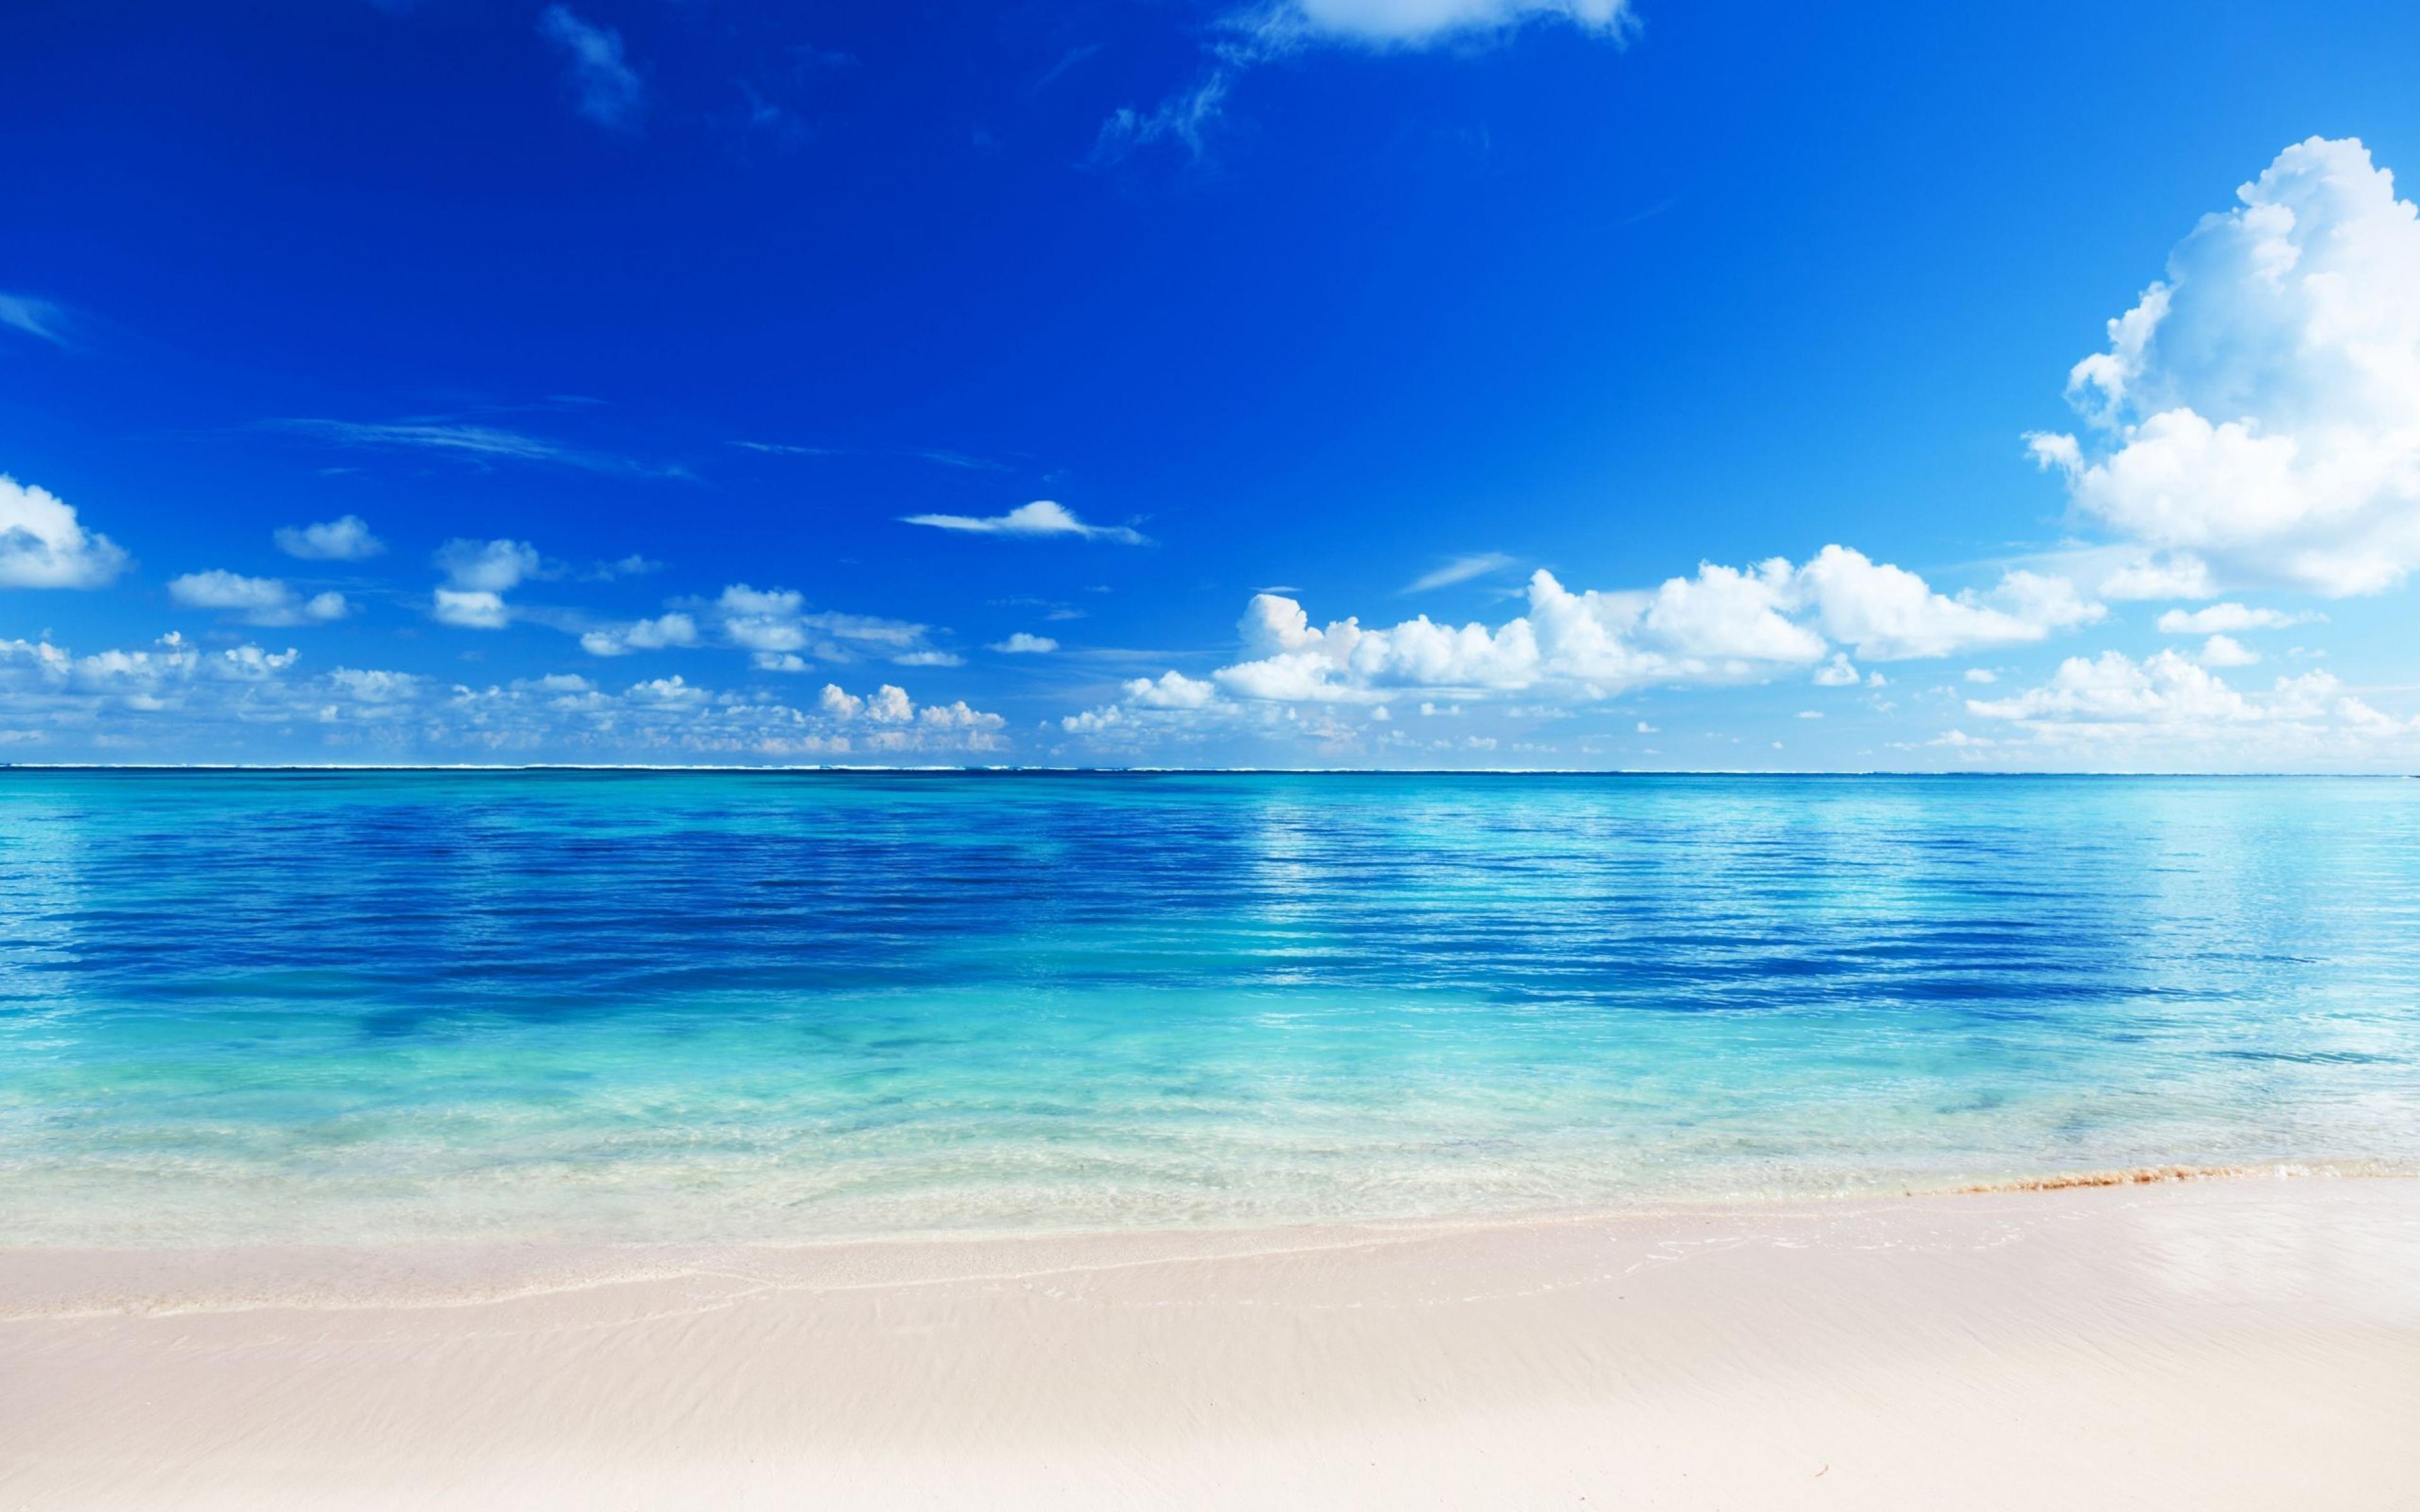 Free Download Wallpaper 3840x2400 Sea Beach Horizon Sand Tropics